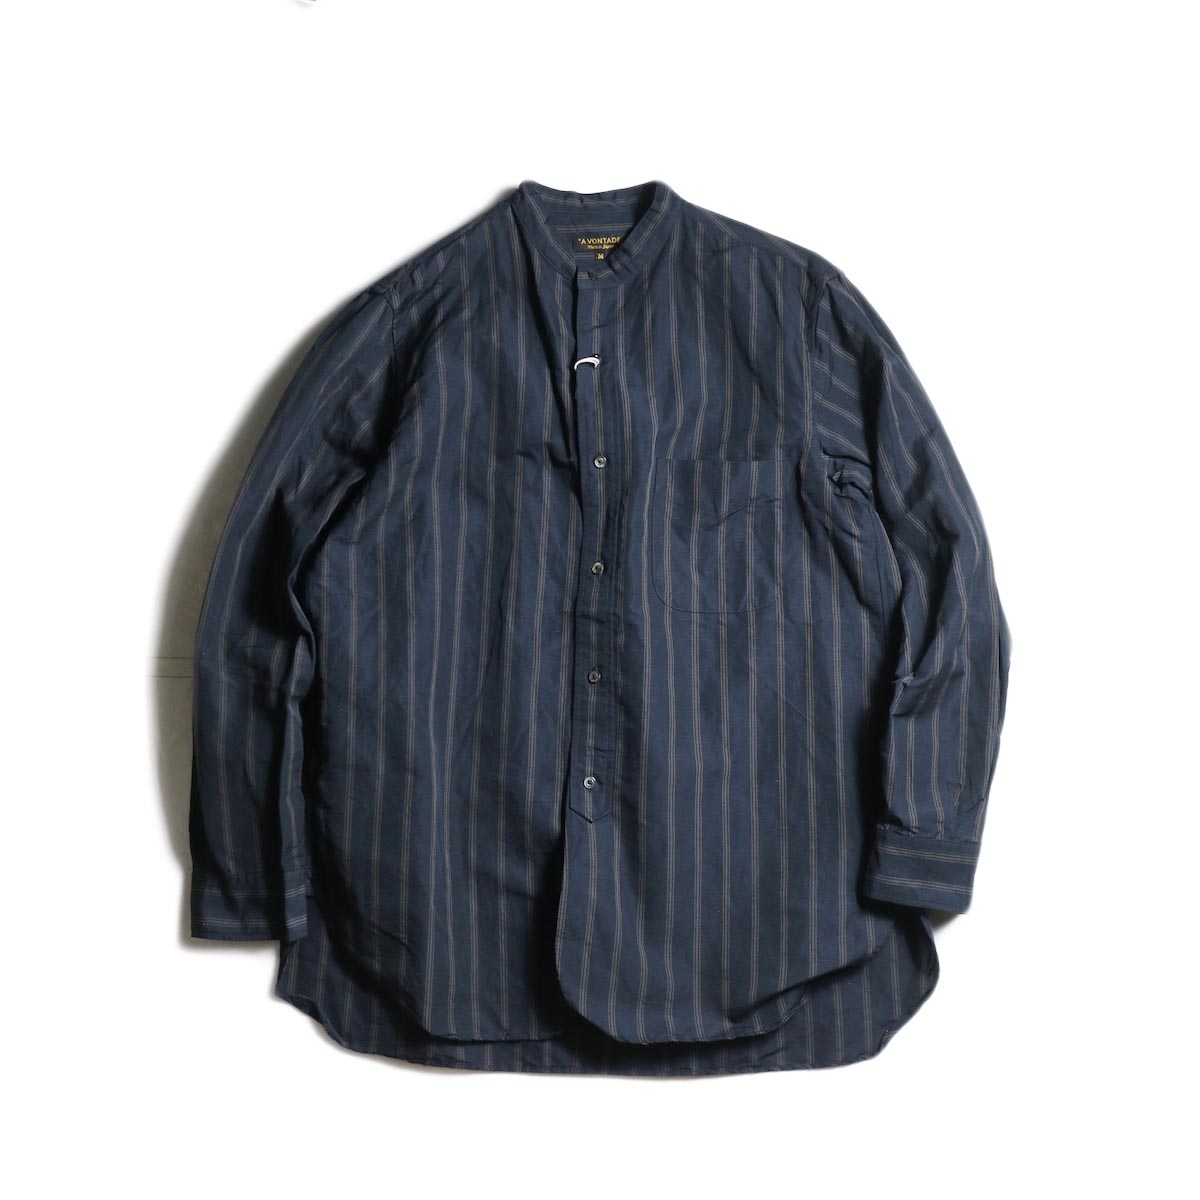 A VONTADE / Banded Collar Shirts (Black Stripe)